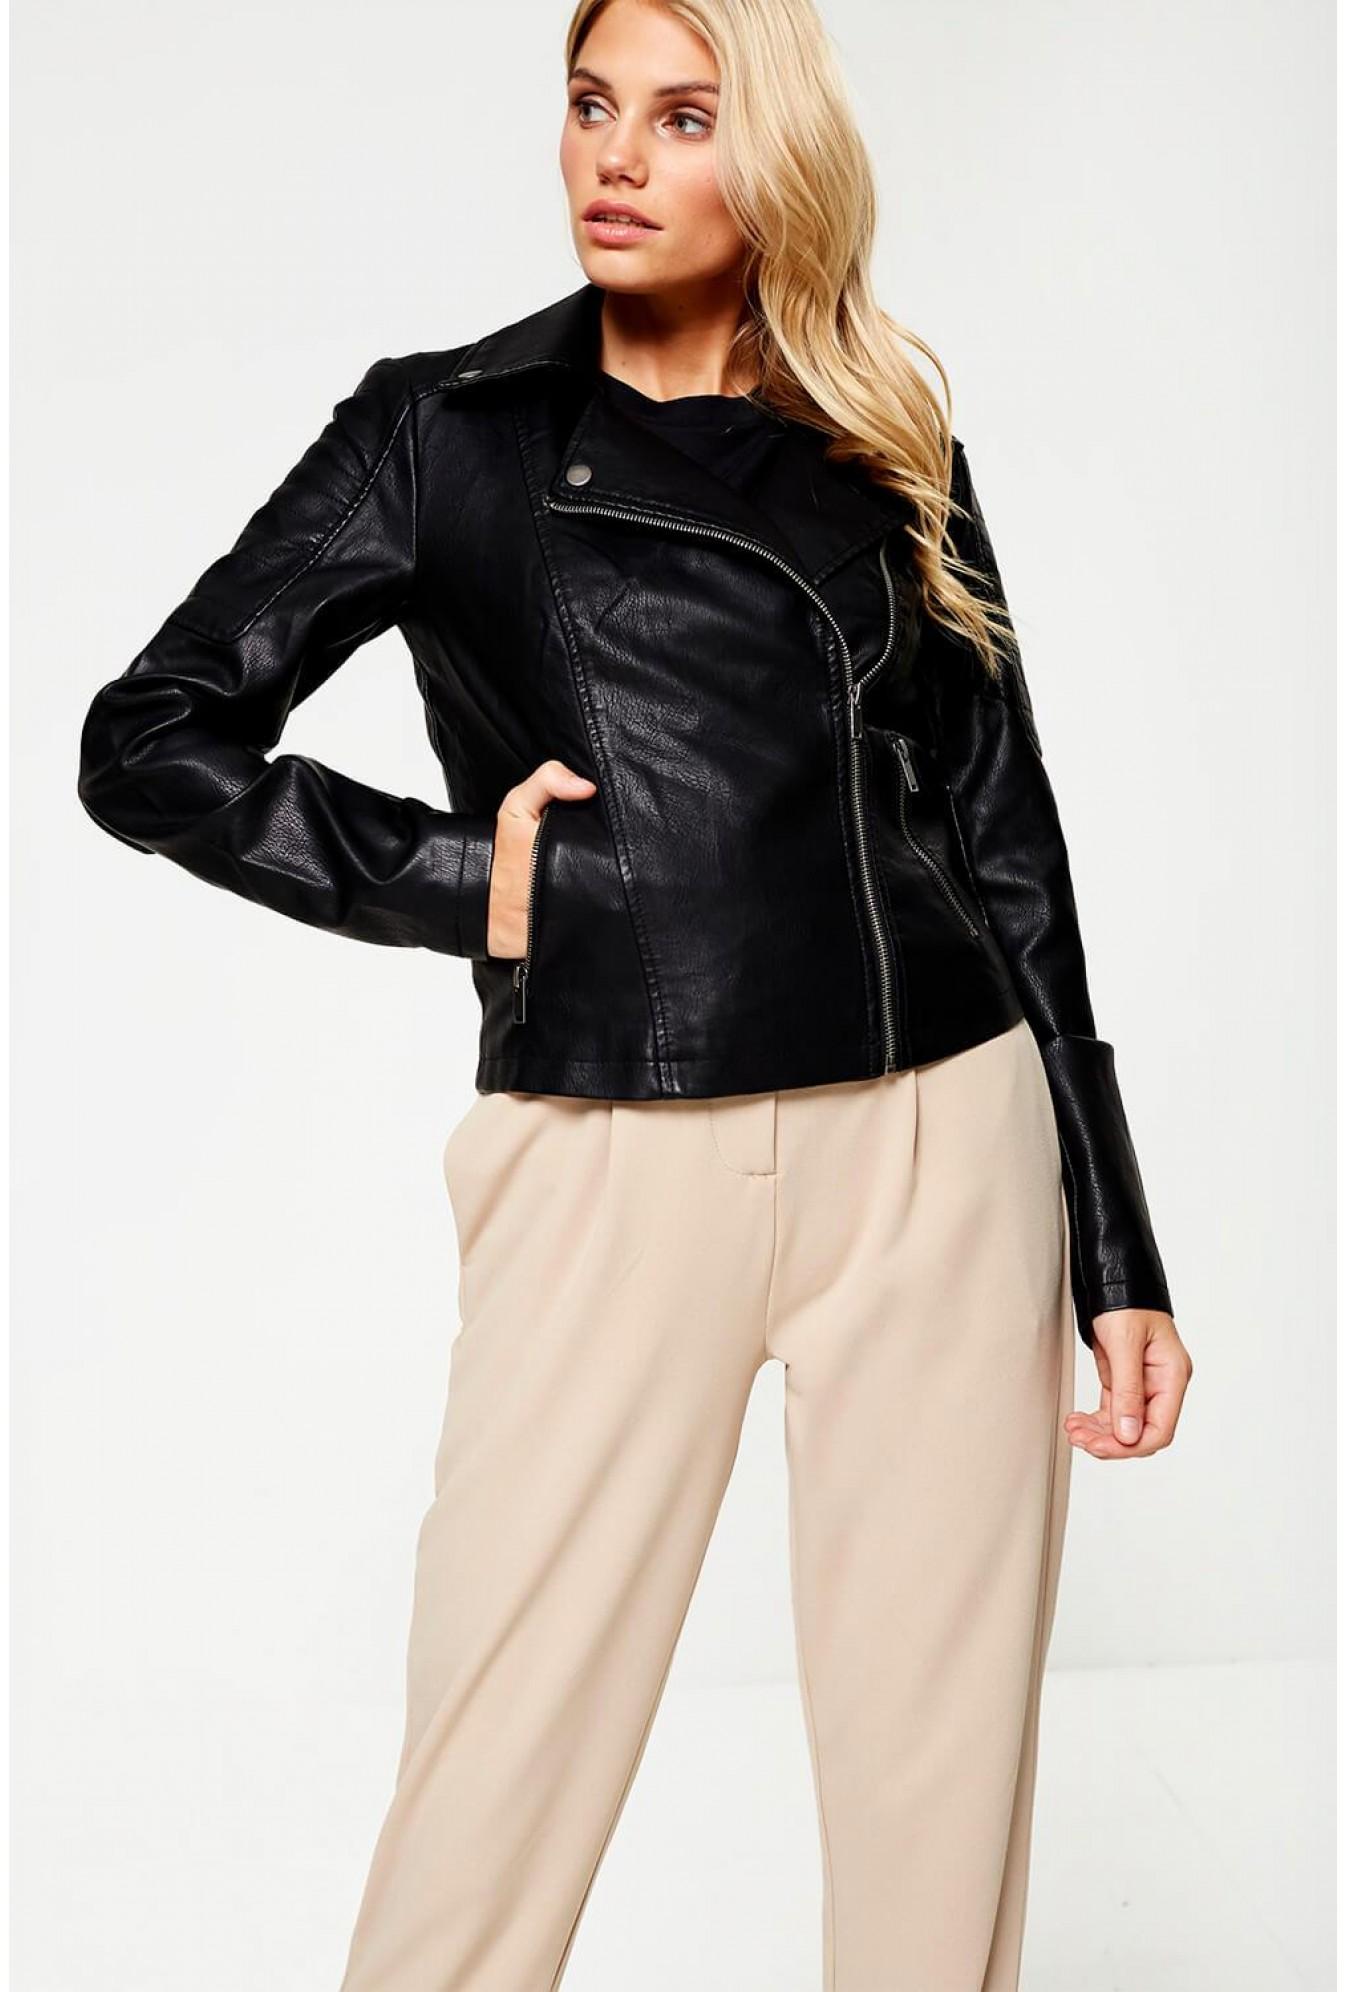 b868047a0e959 Noisy May Rebel Long Sleeve Faux Leather Jacket in Black